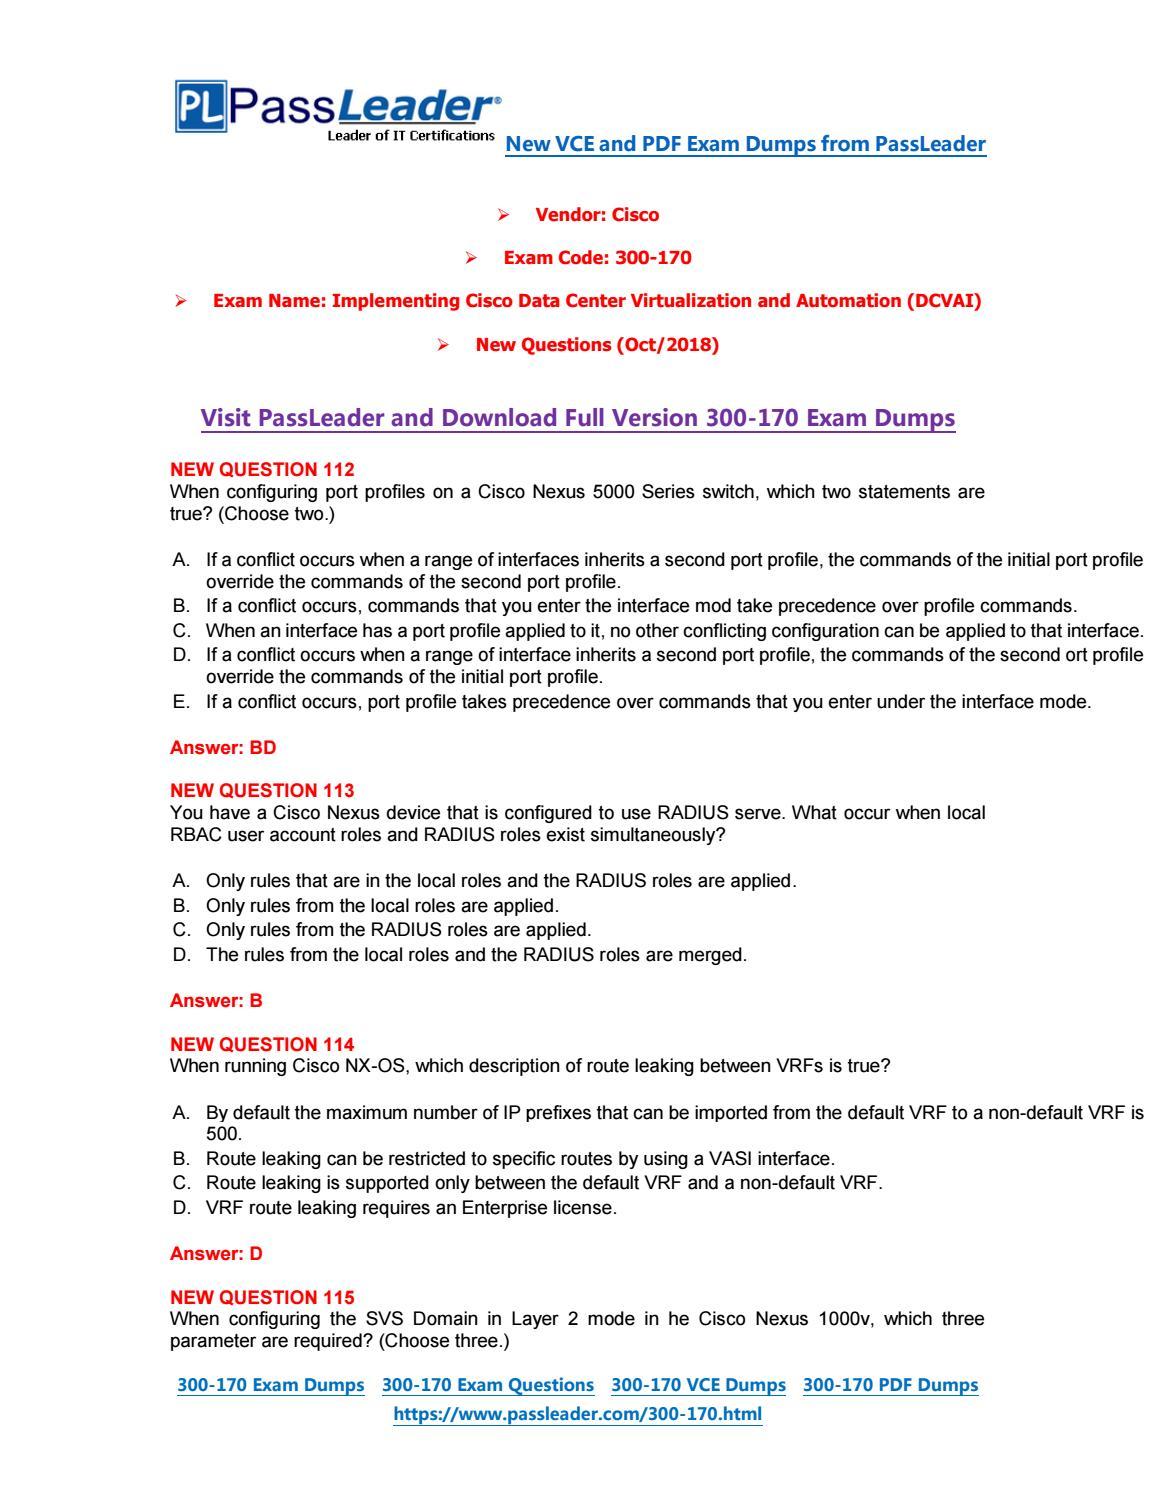 2019-New-PassLeader-300-170-Exam-Dumps-VCE-PDF-Braindumps-Exam